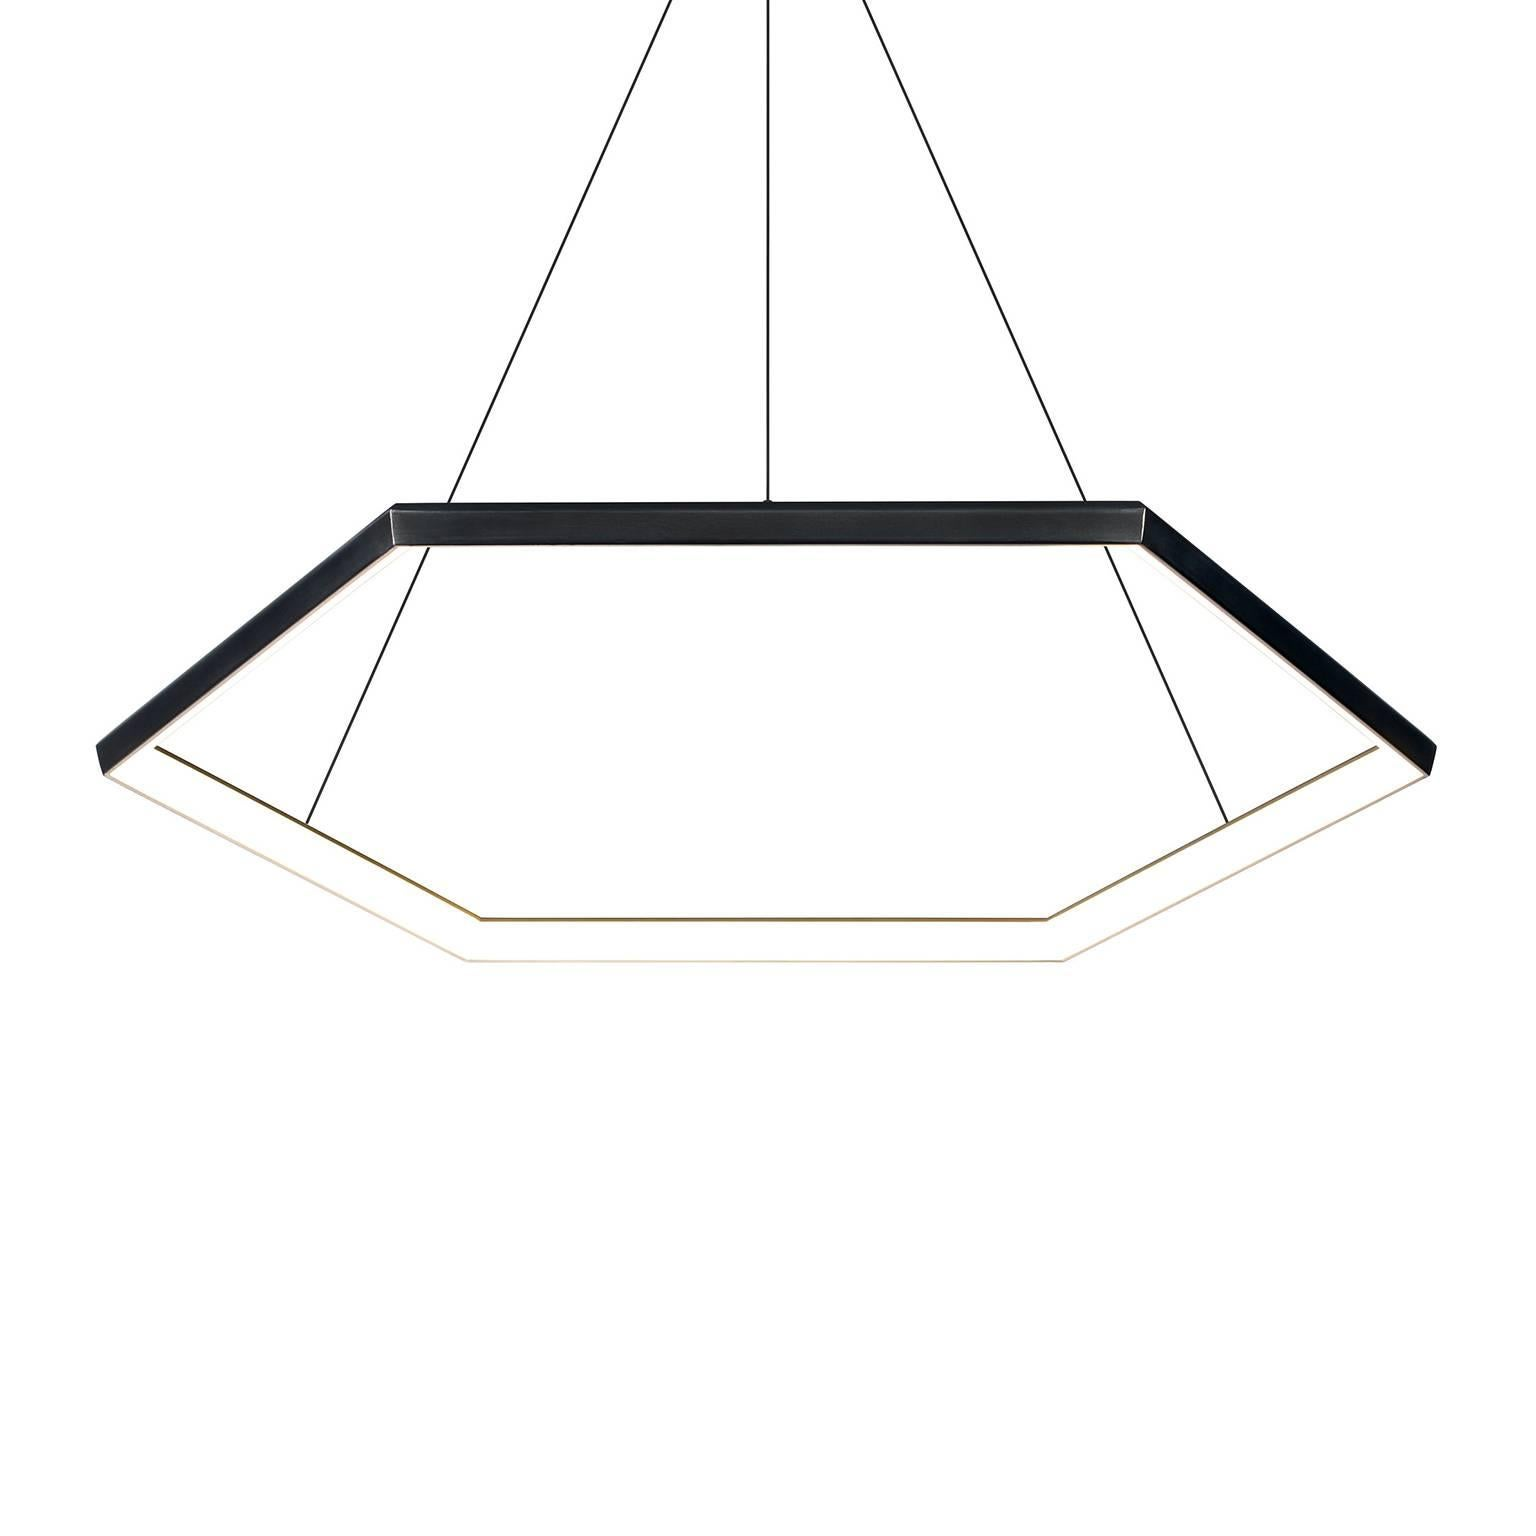 HEXIA HX46 - Black Hexagon Geometric Modern LED Chandelier Light Fixture